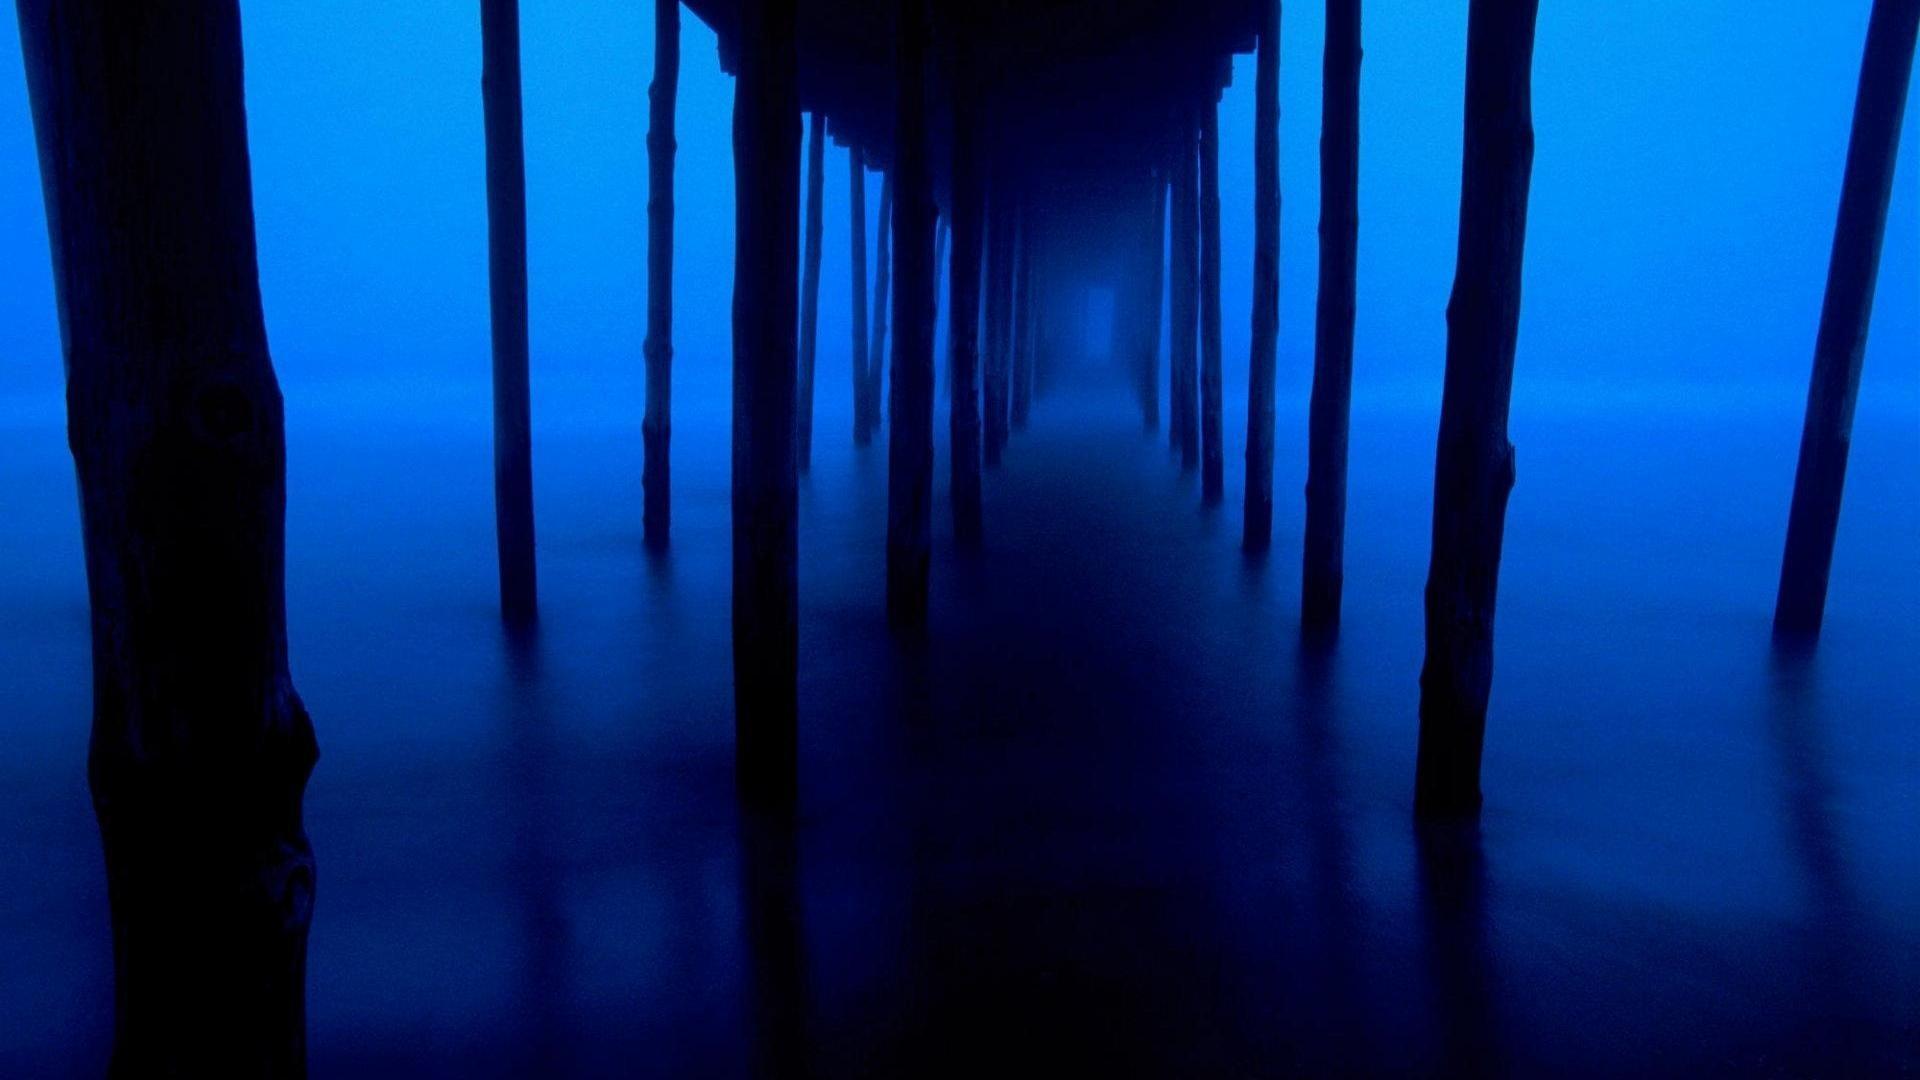 Dark-blue-wallpaper-support-bridge-mysterious